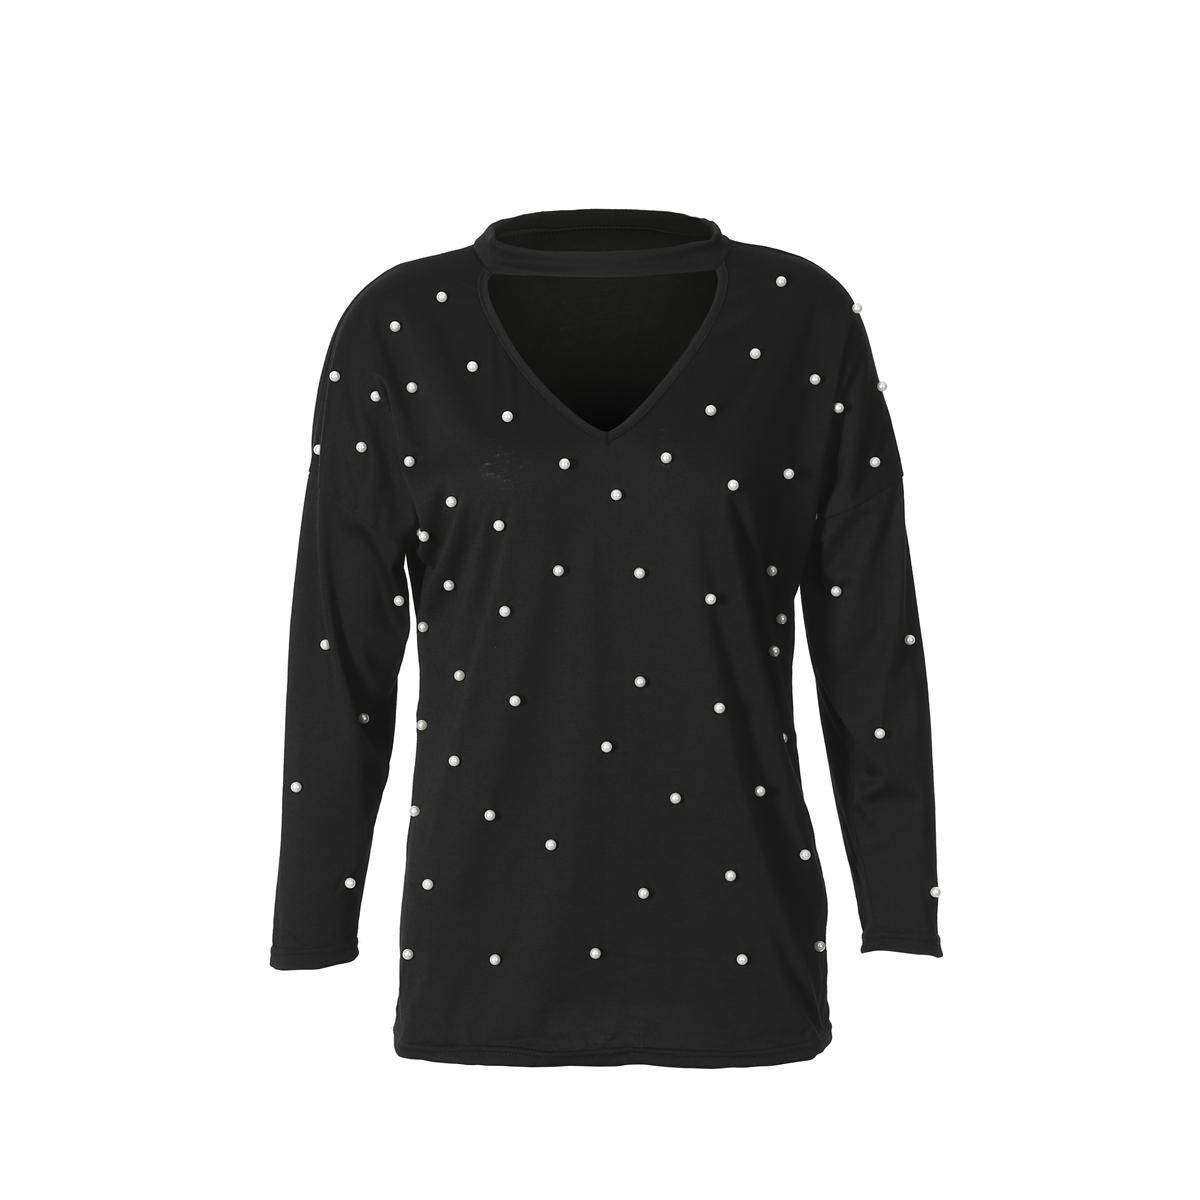 Mode féminine Perle perlage V Cut Choker Casual manches longues T-shirt Hauts Tops Cut Ladies